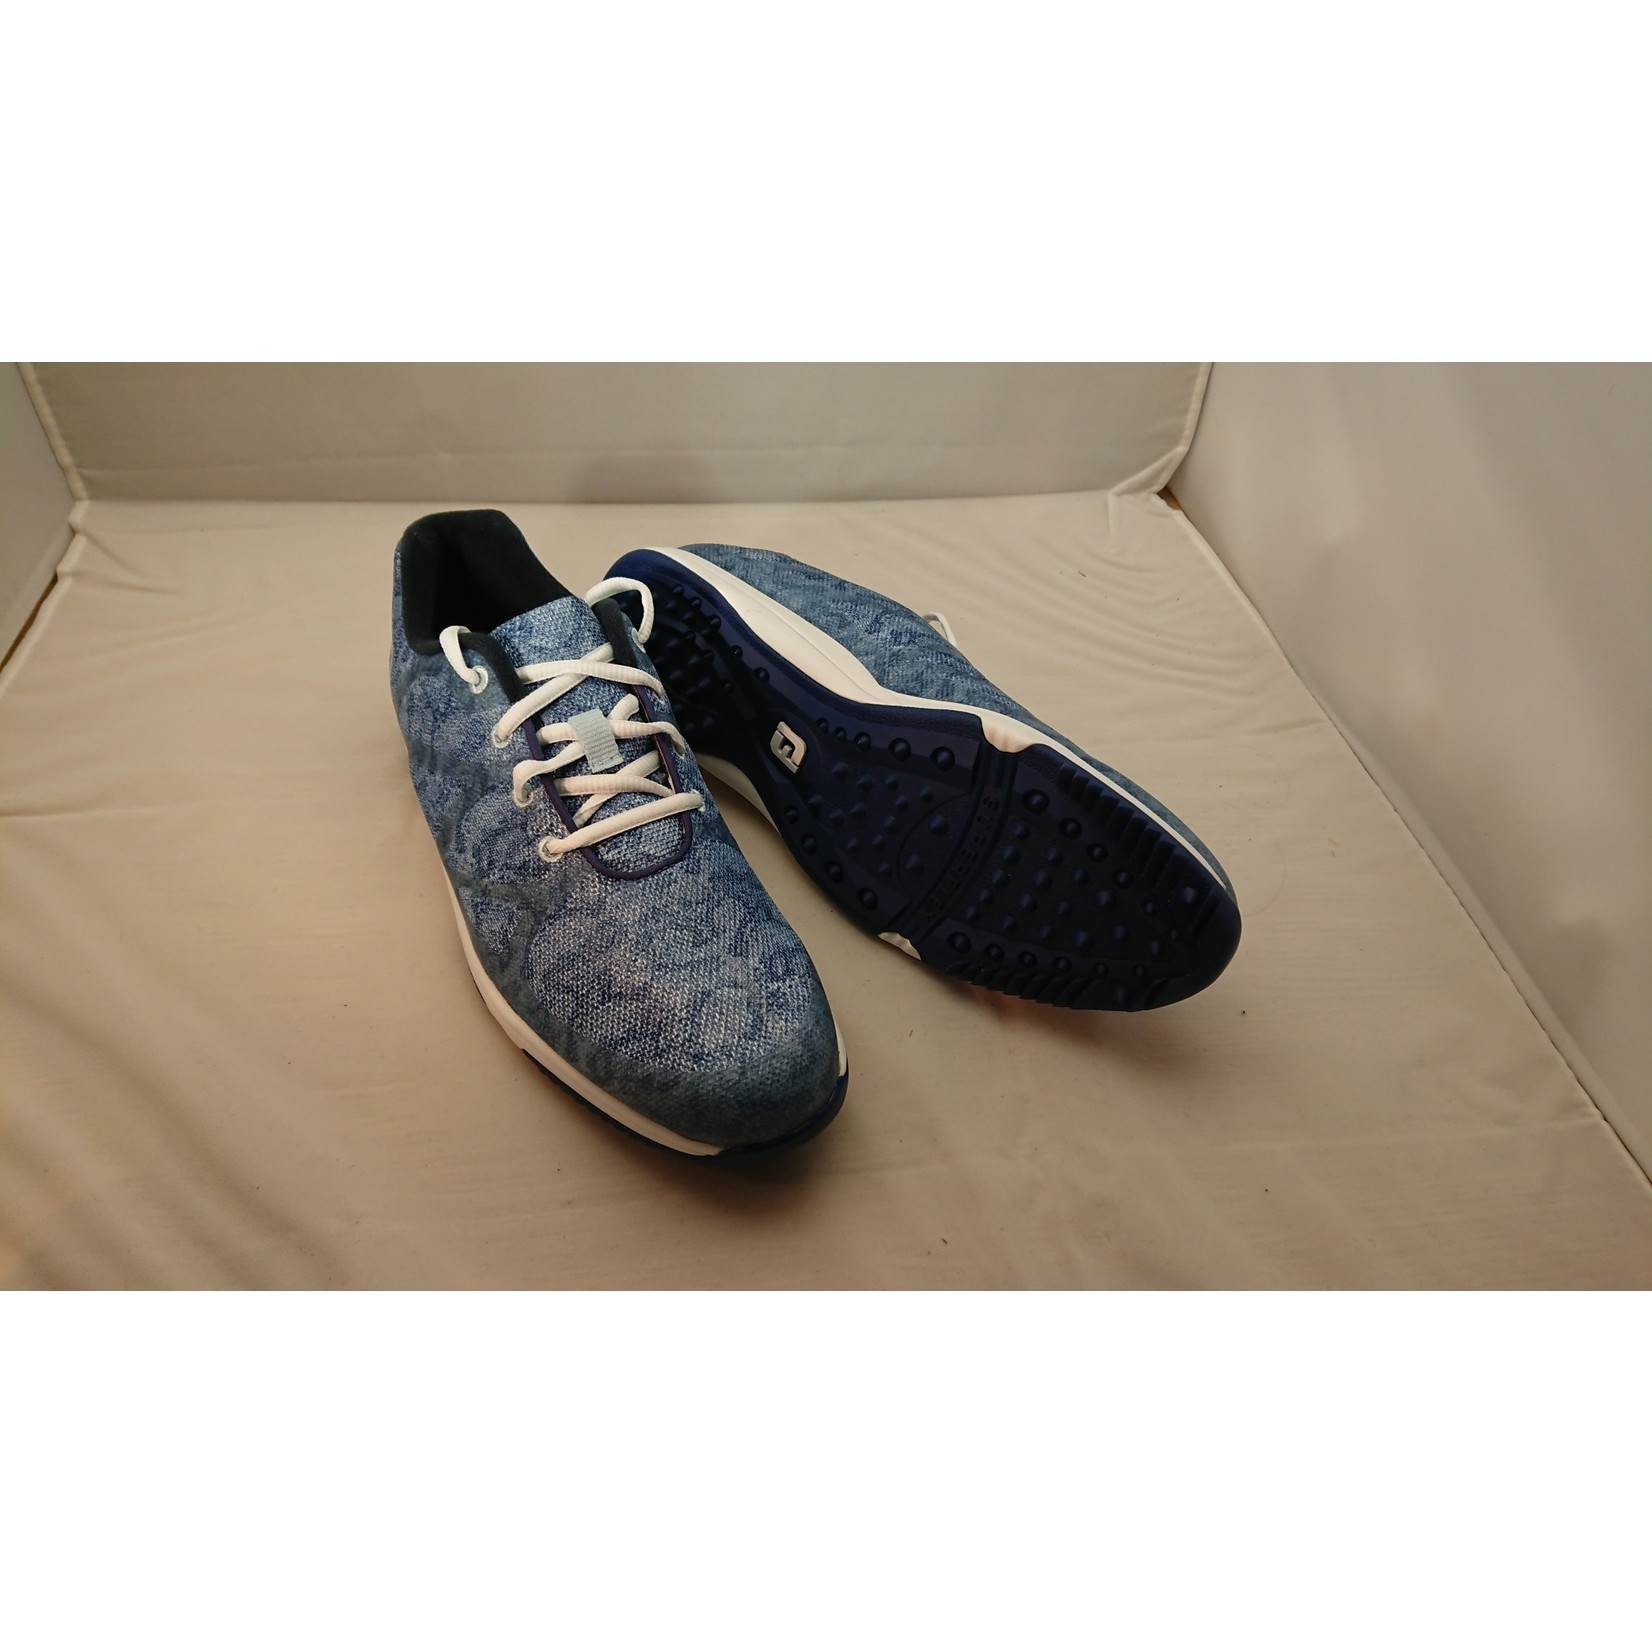 Footjoy Footjoy Leisure Blauw 42